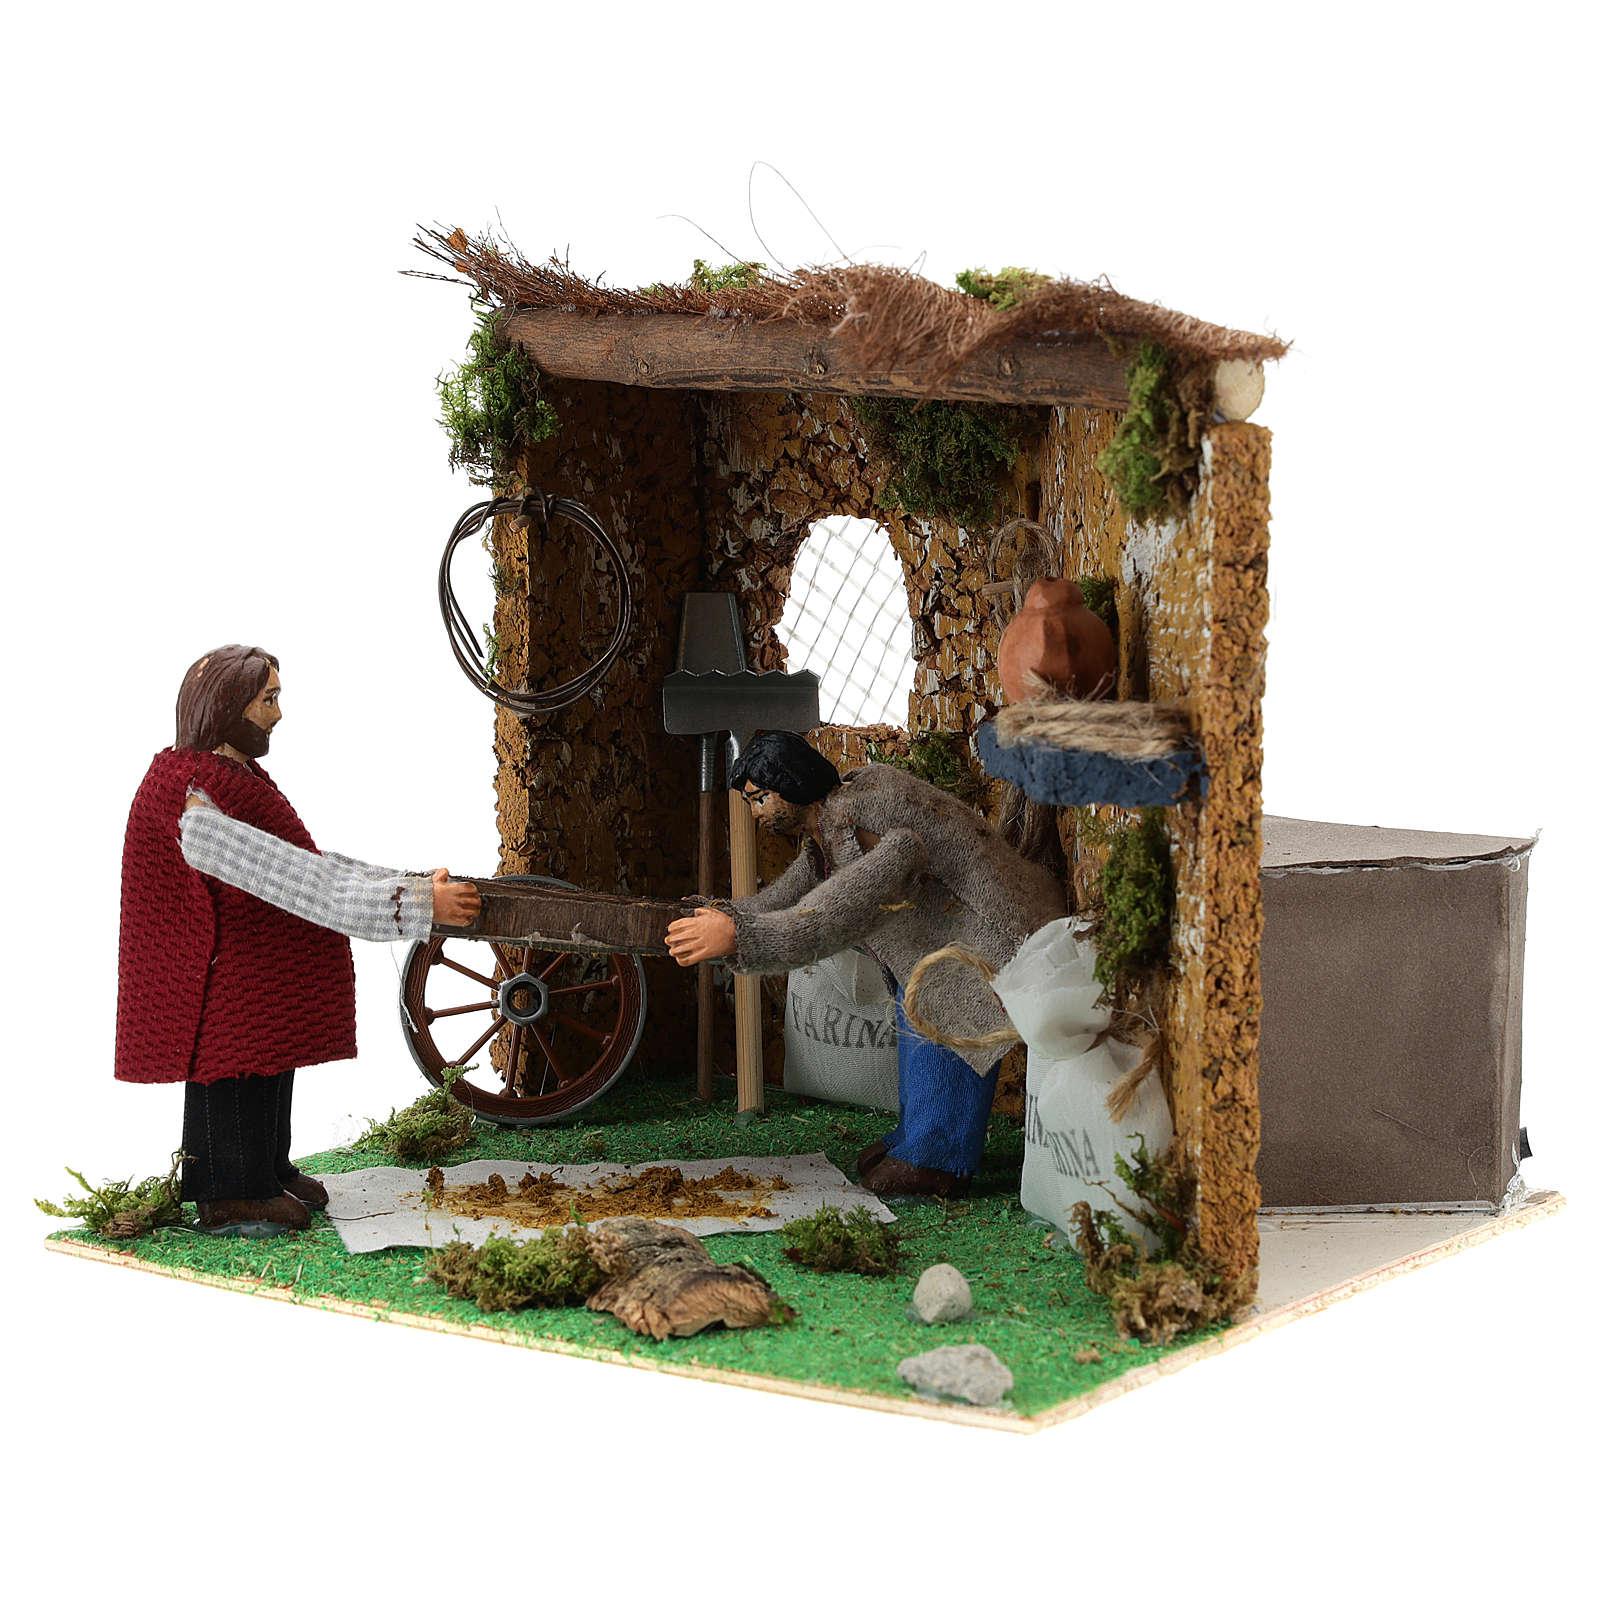 Neapolitan nativity scene farmers sifting with movement 10 cm 4